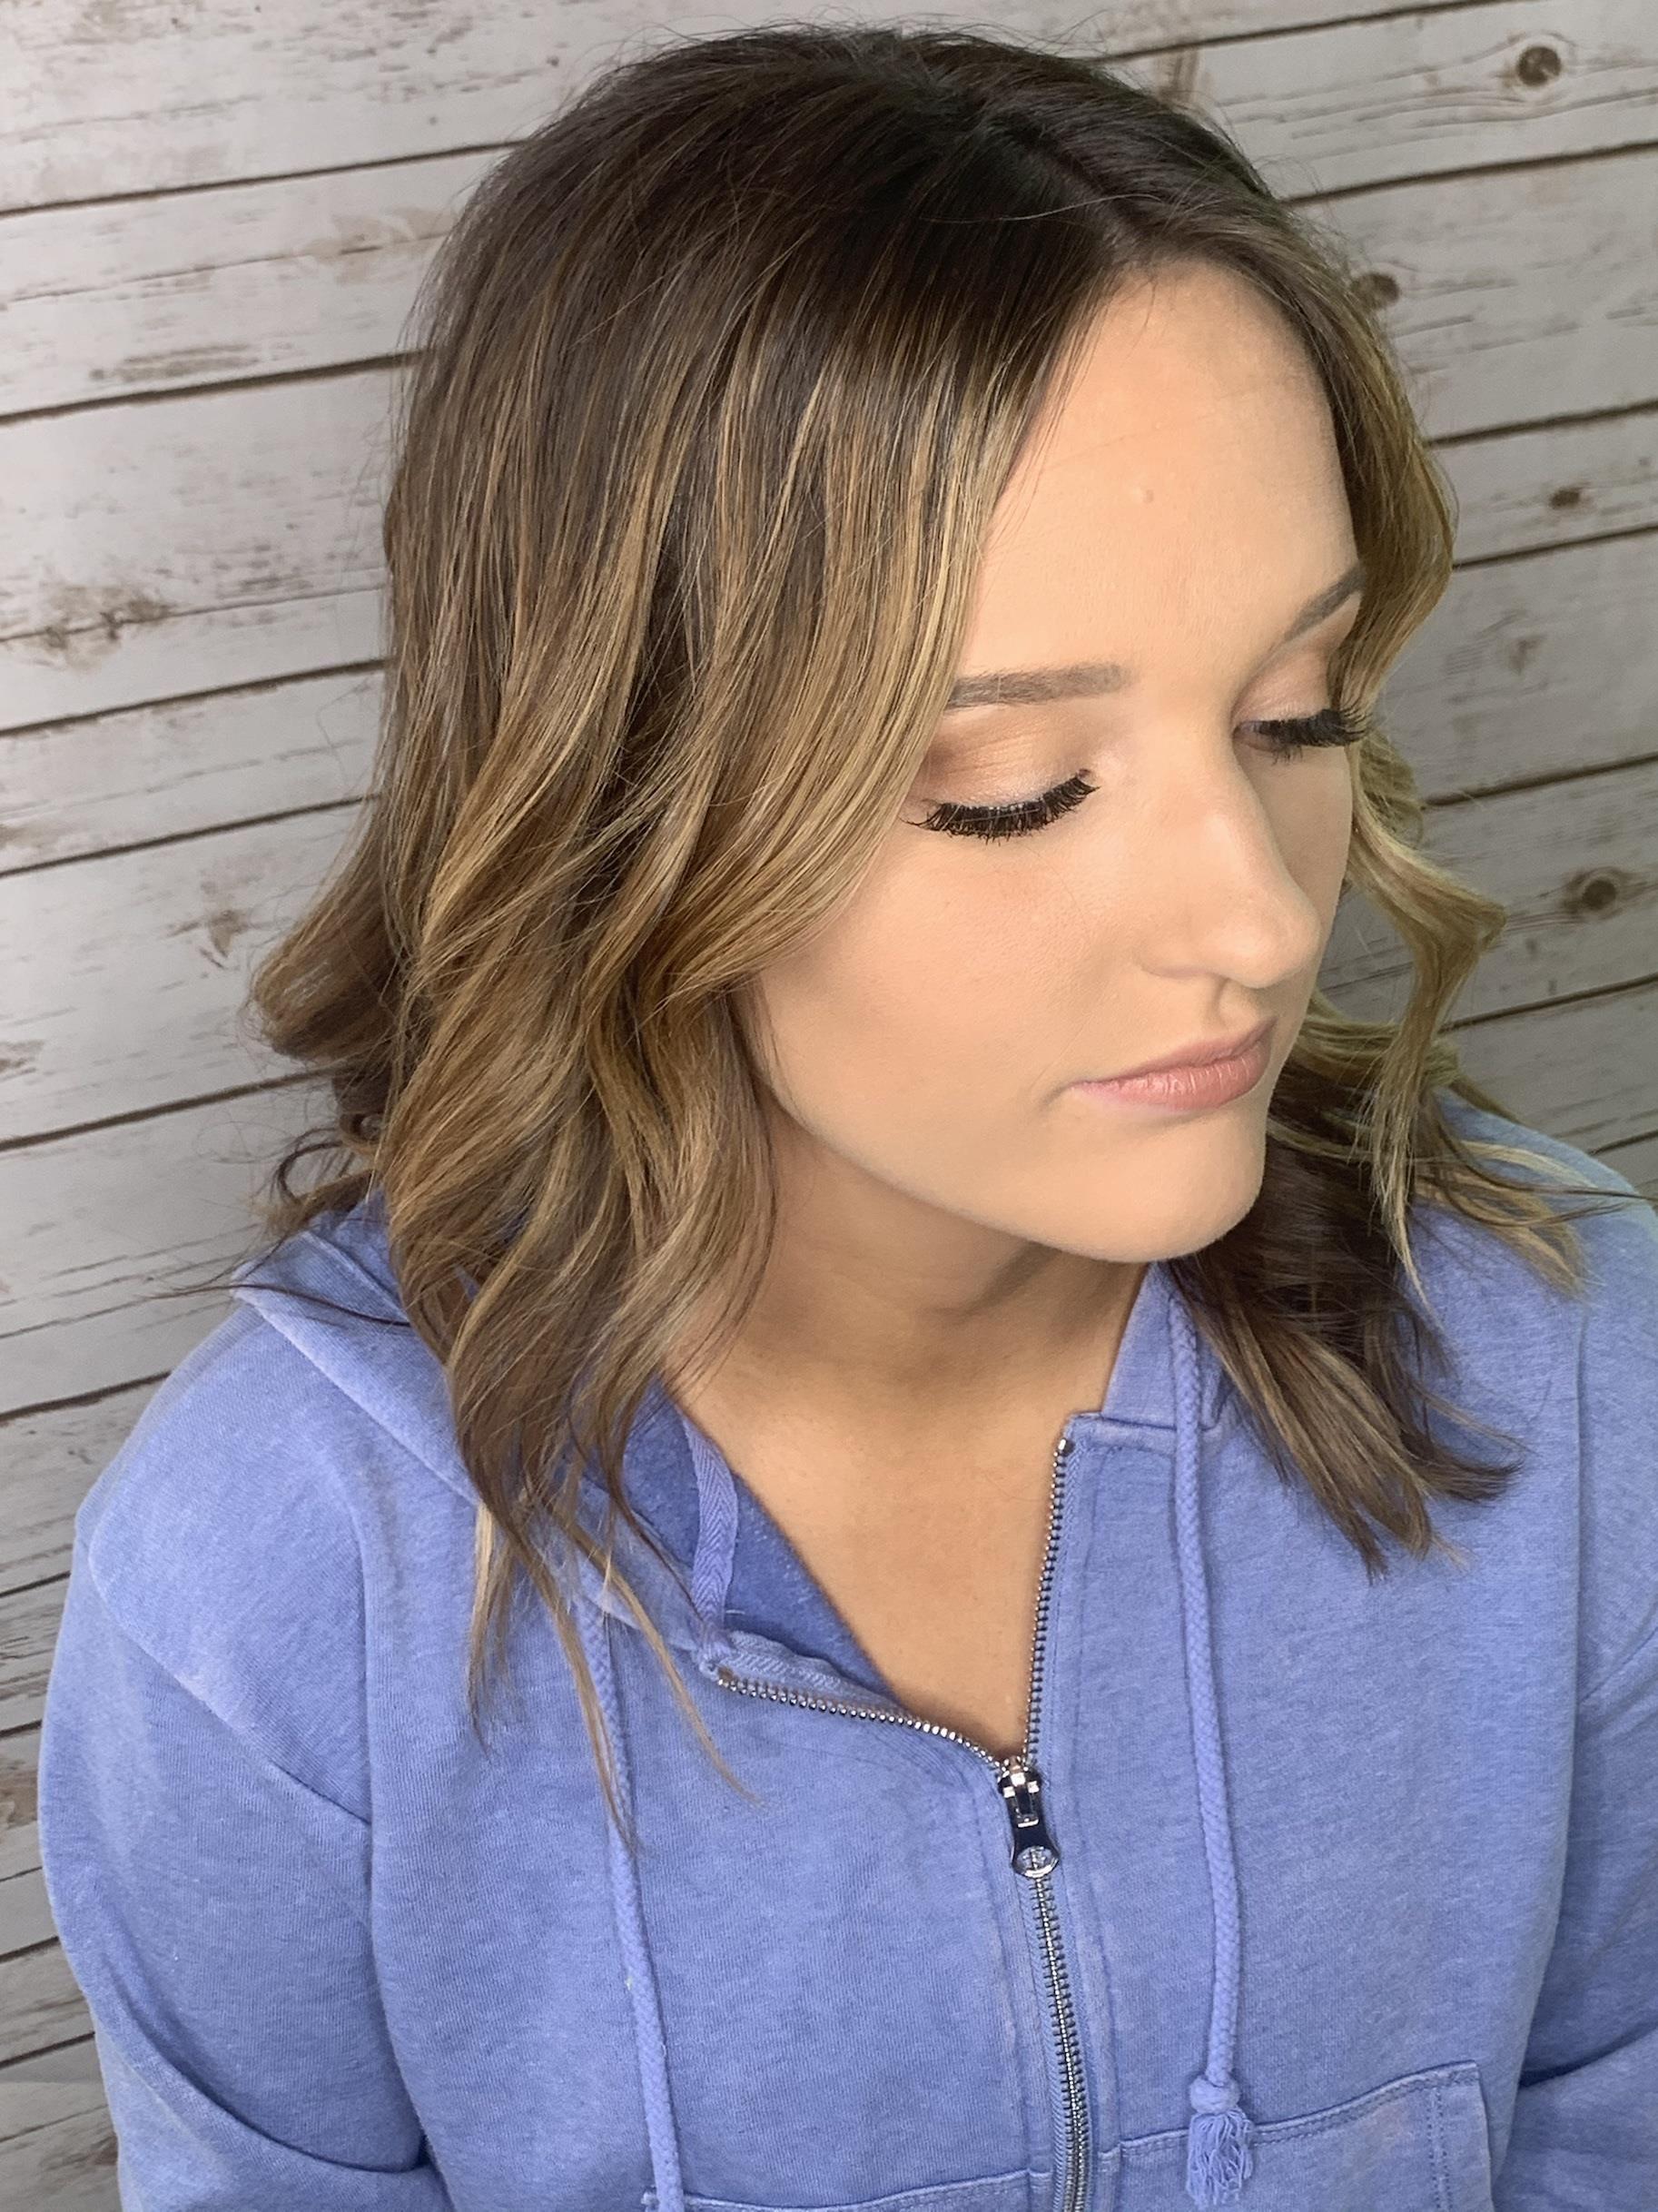 Makeup Application 35 Airbrush to traditional makeup